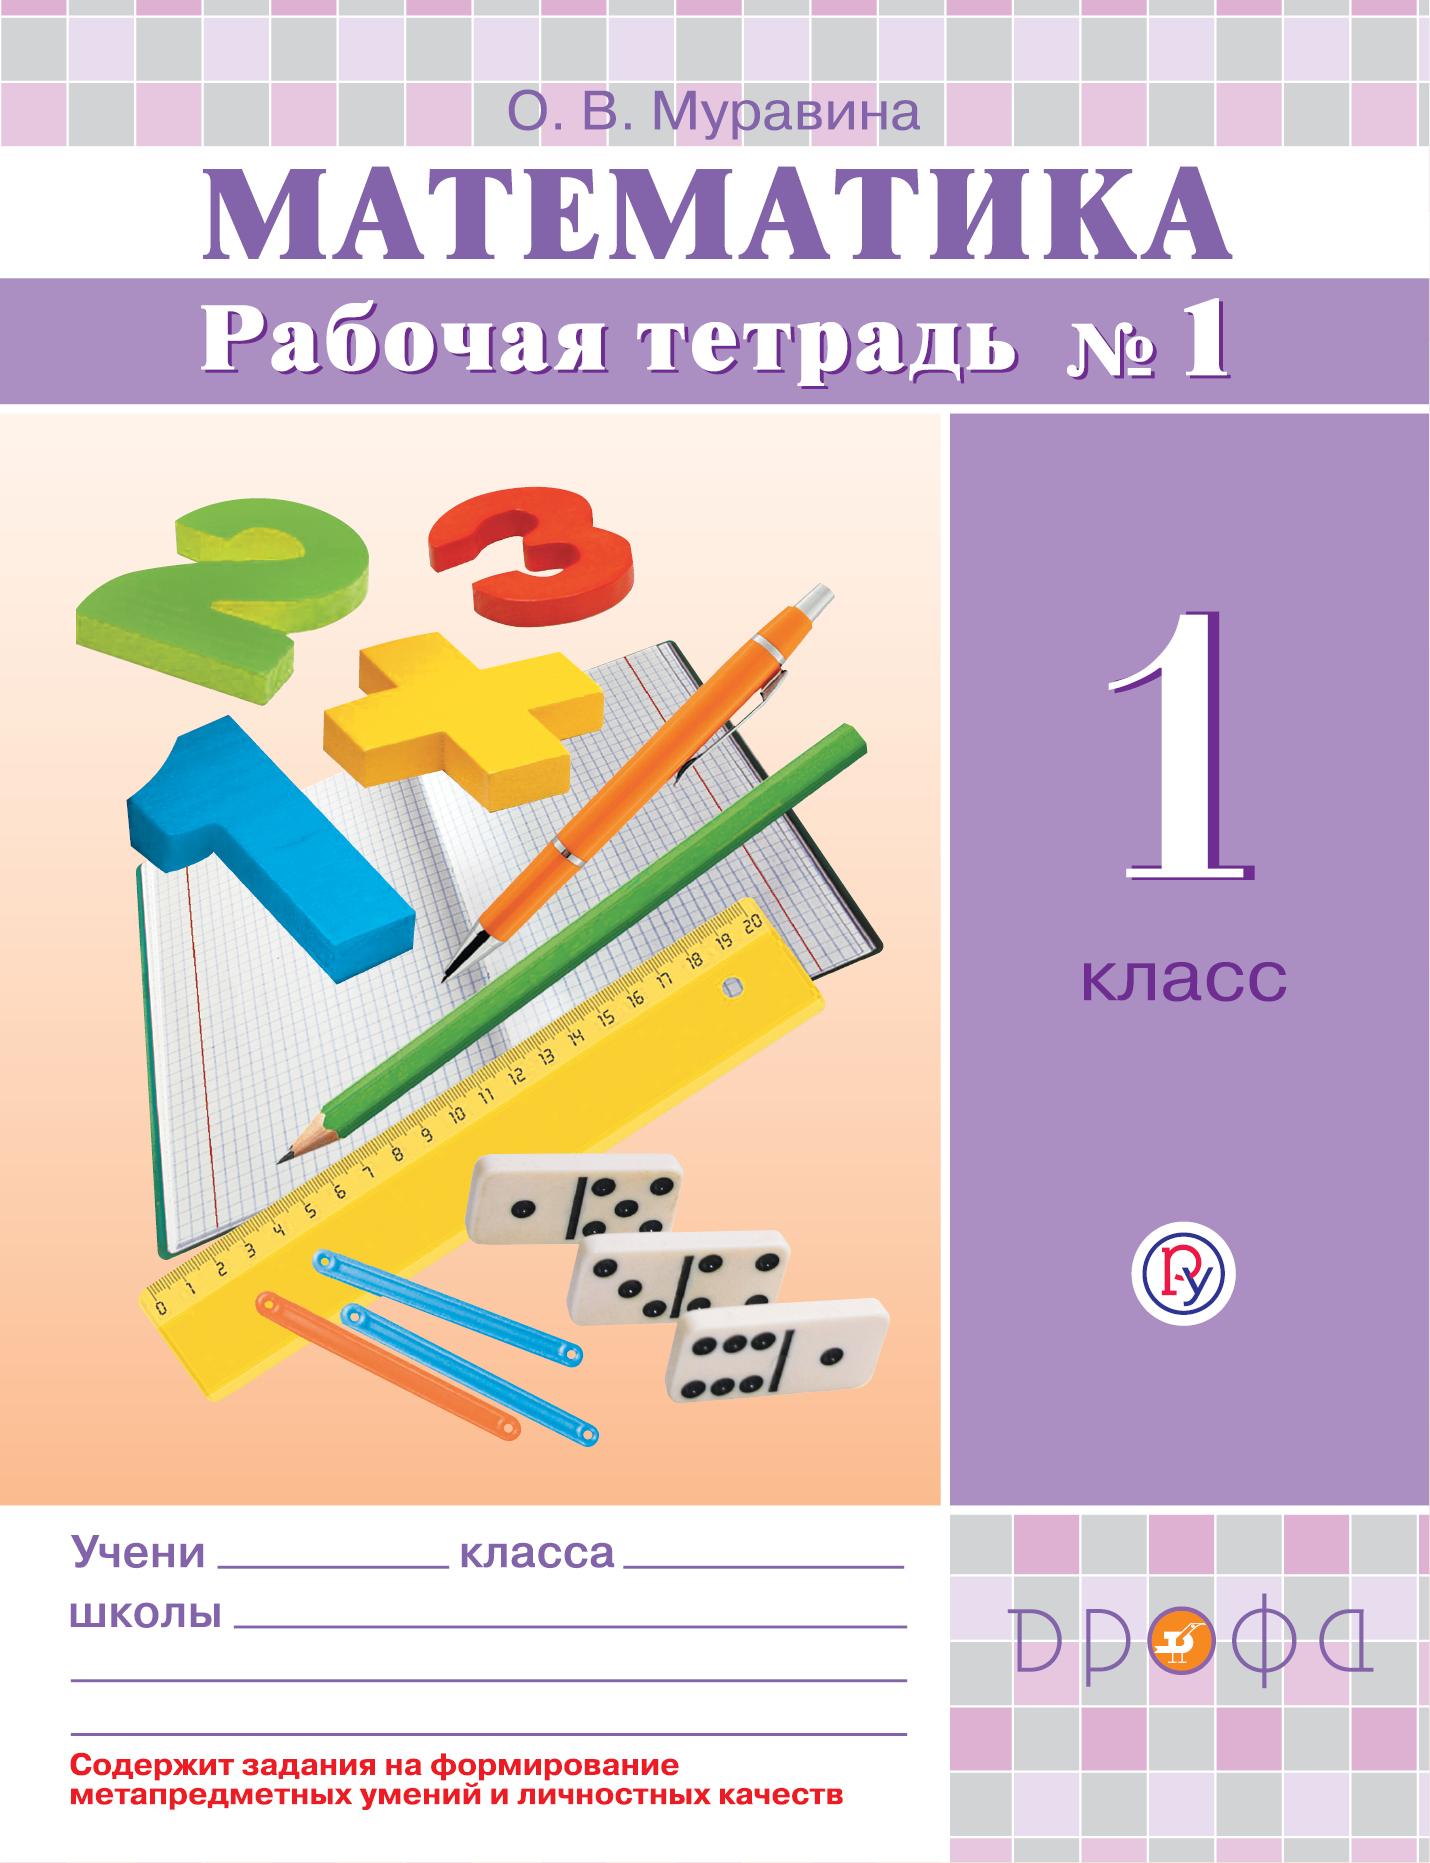 Муравина О.В. Математика. 1 класс. Рабочая тетрадь №1